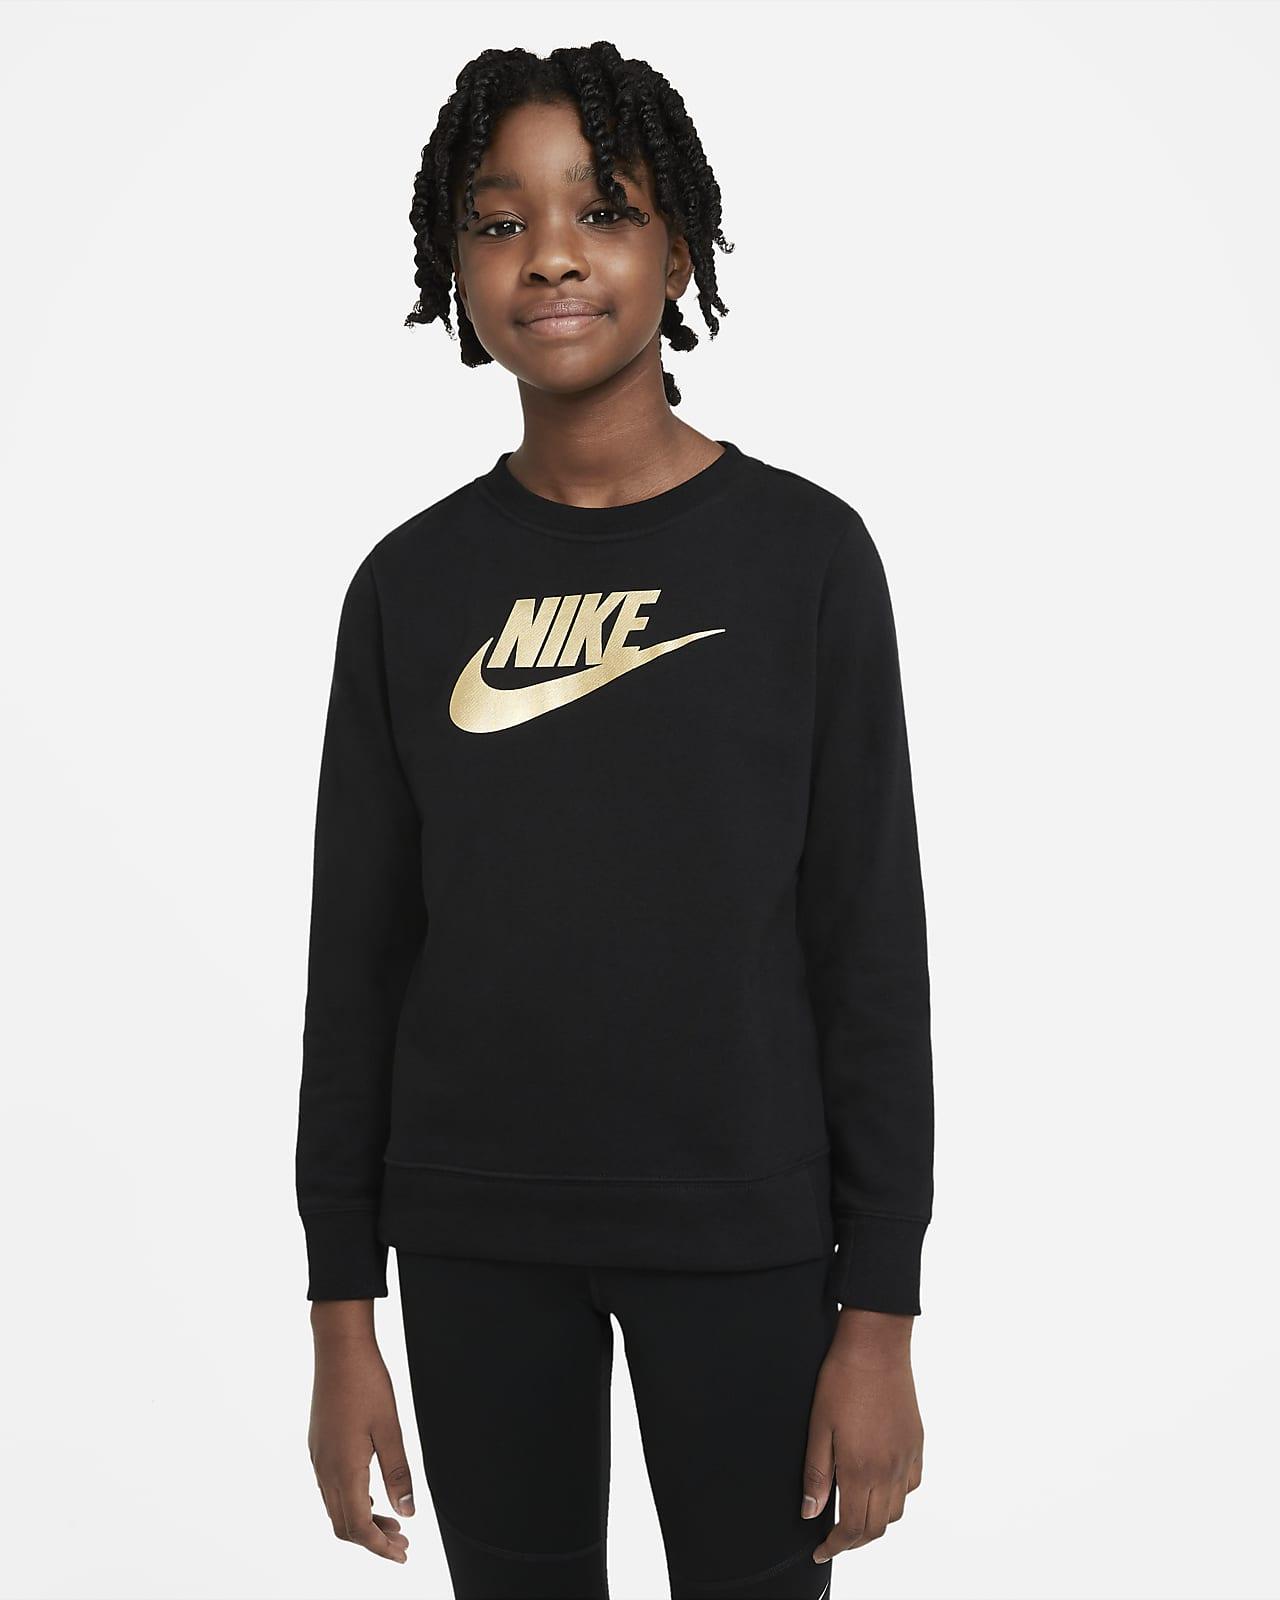 Crew από ύφασμα French Terry Nike Sportswear για μεγάλα κορίτσια